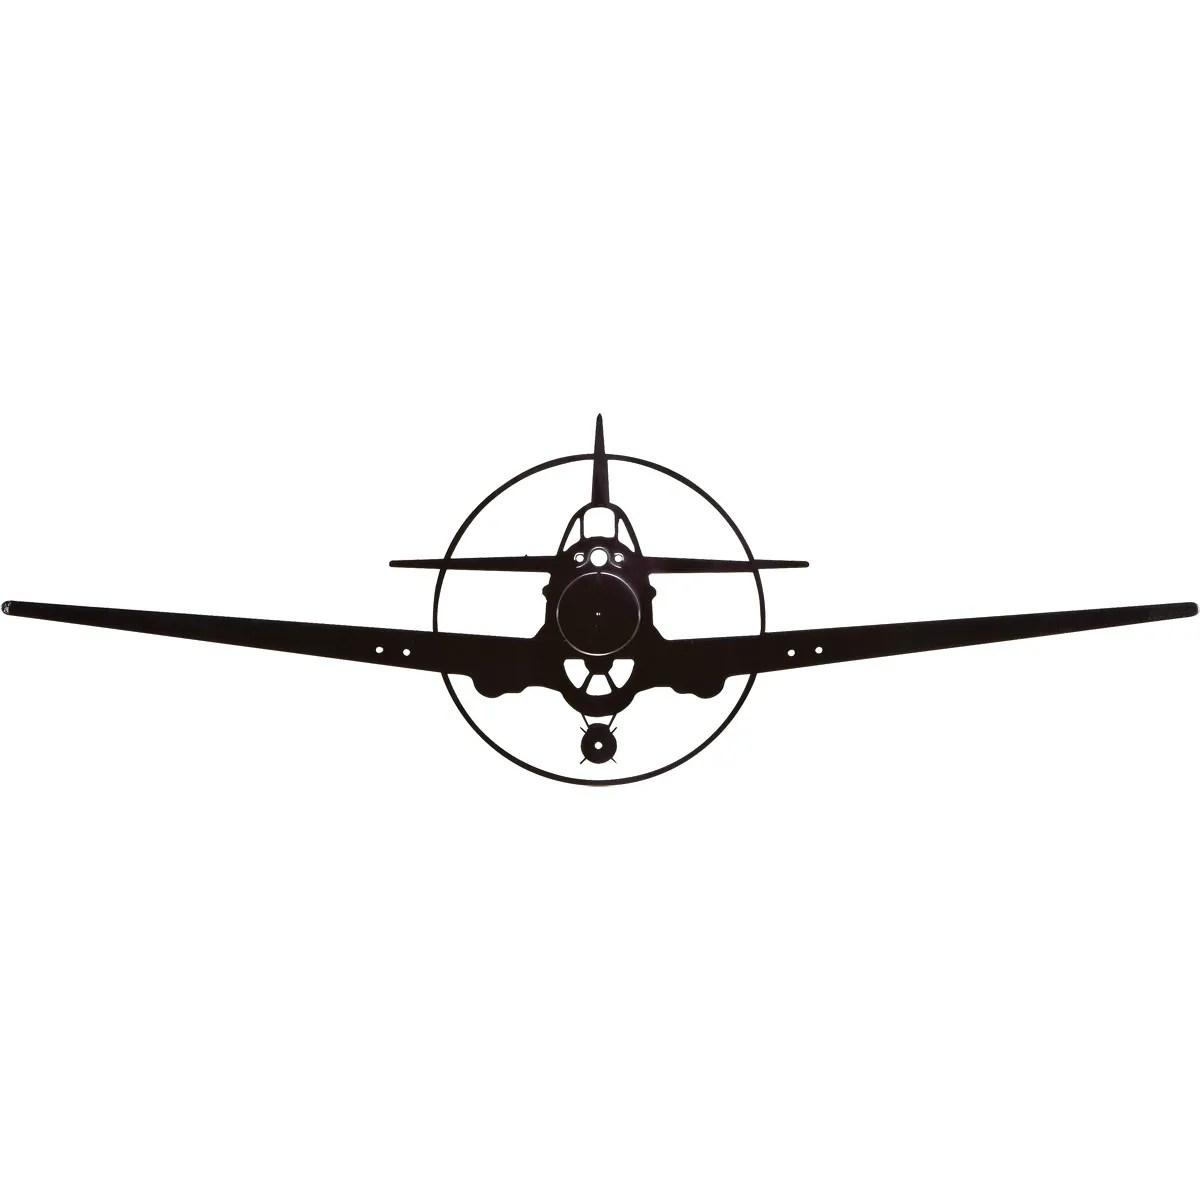 P40 Warhawk Silhouette Aircraft Metal Sign